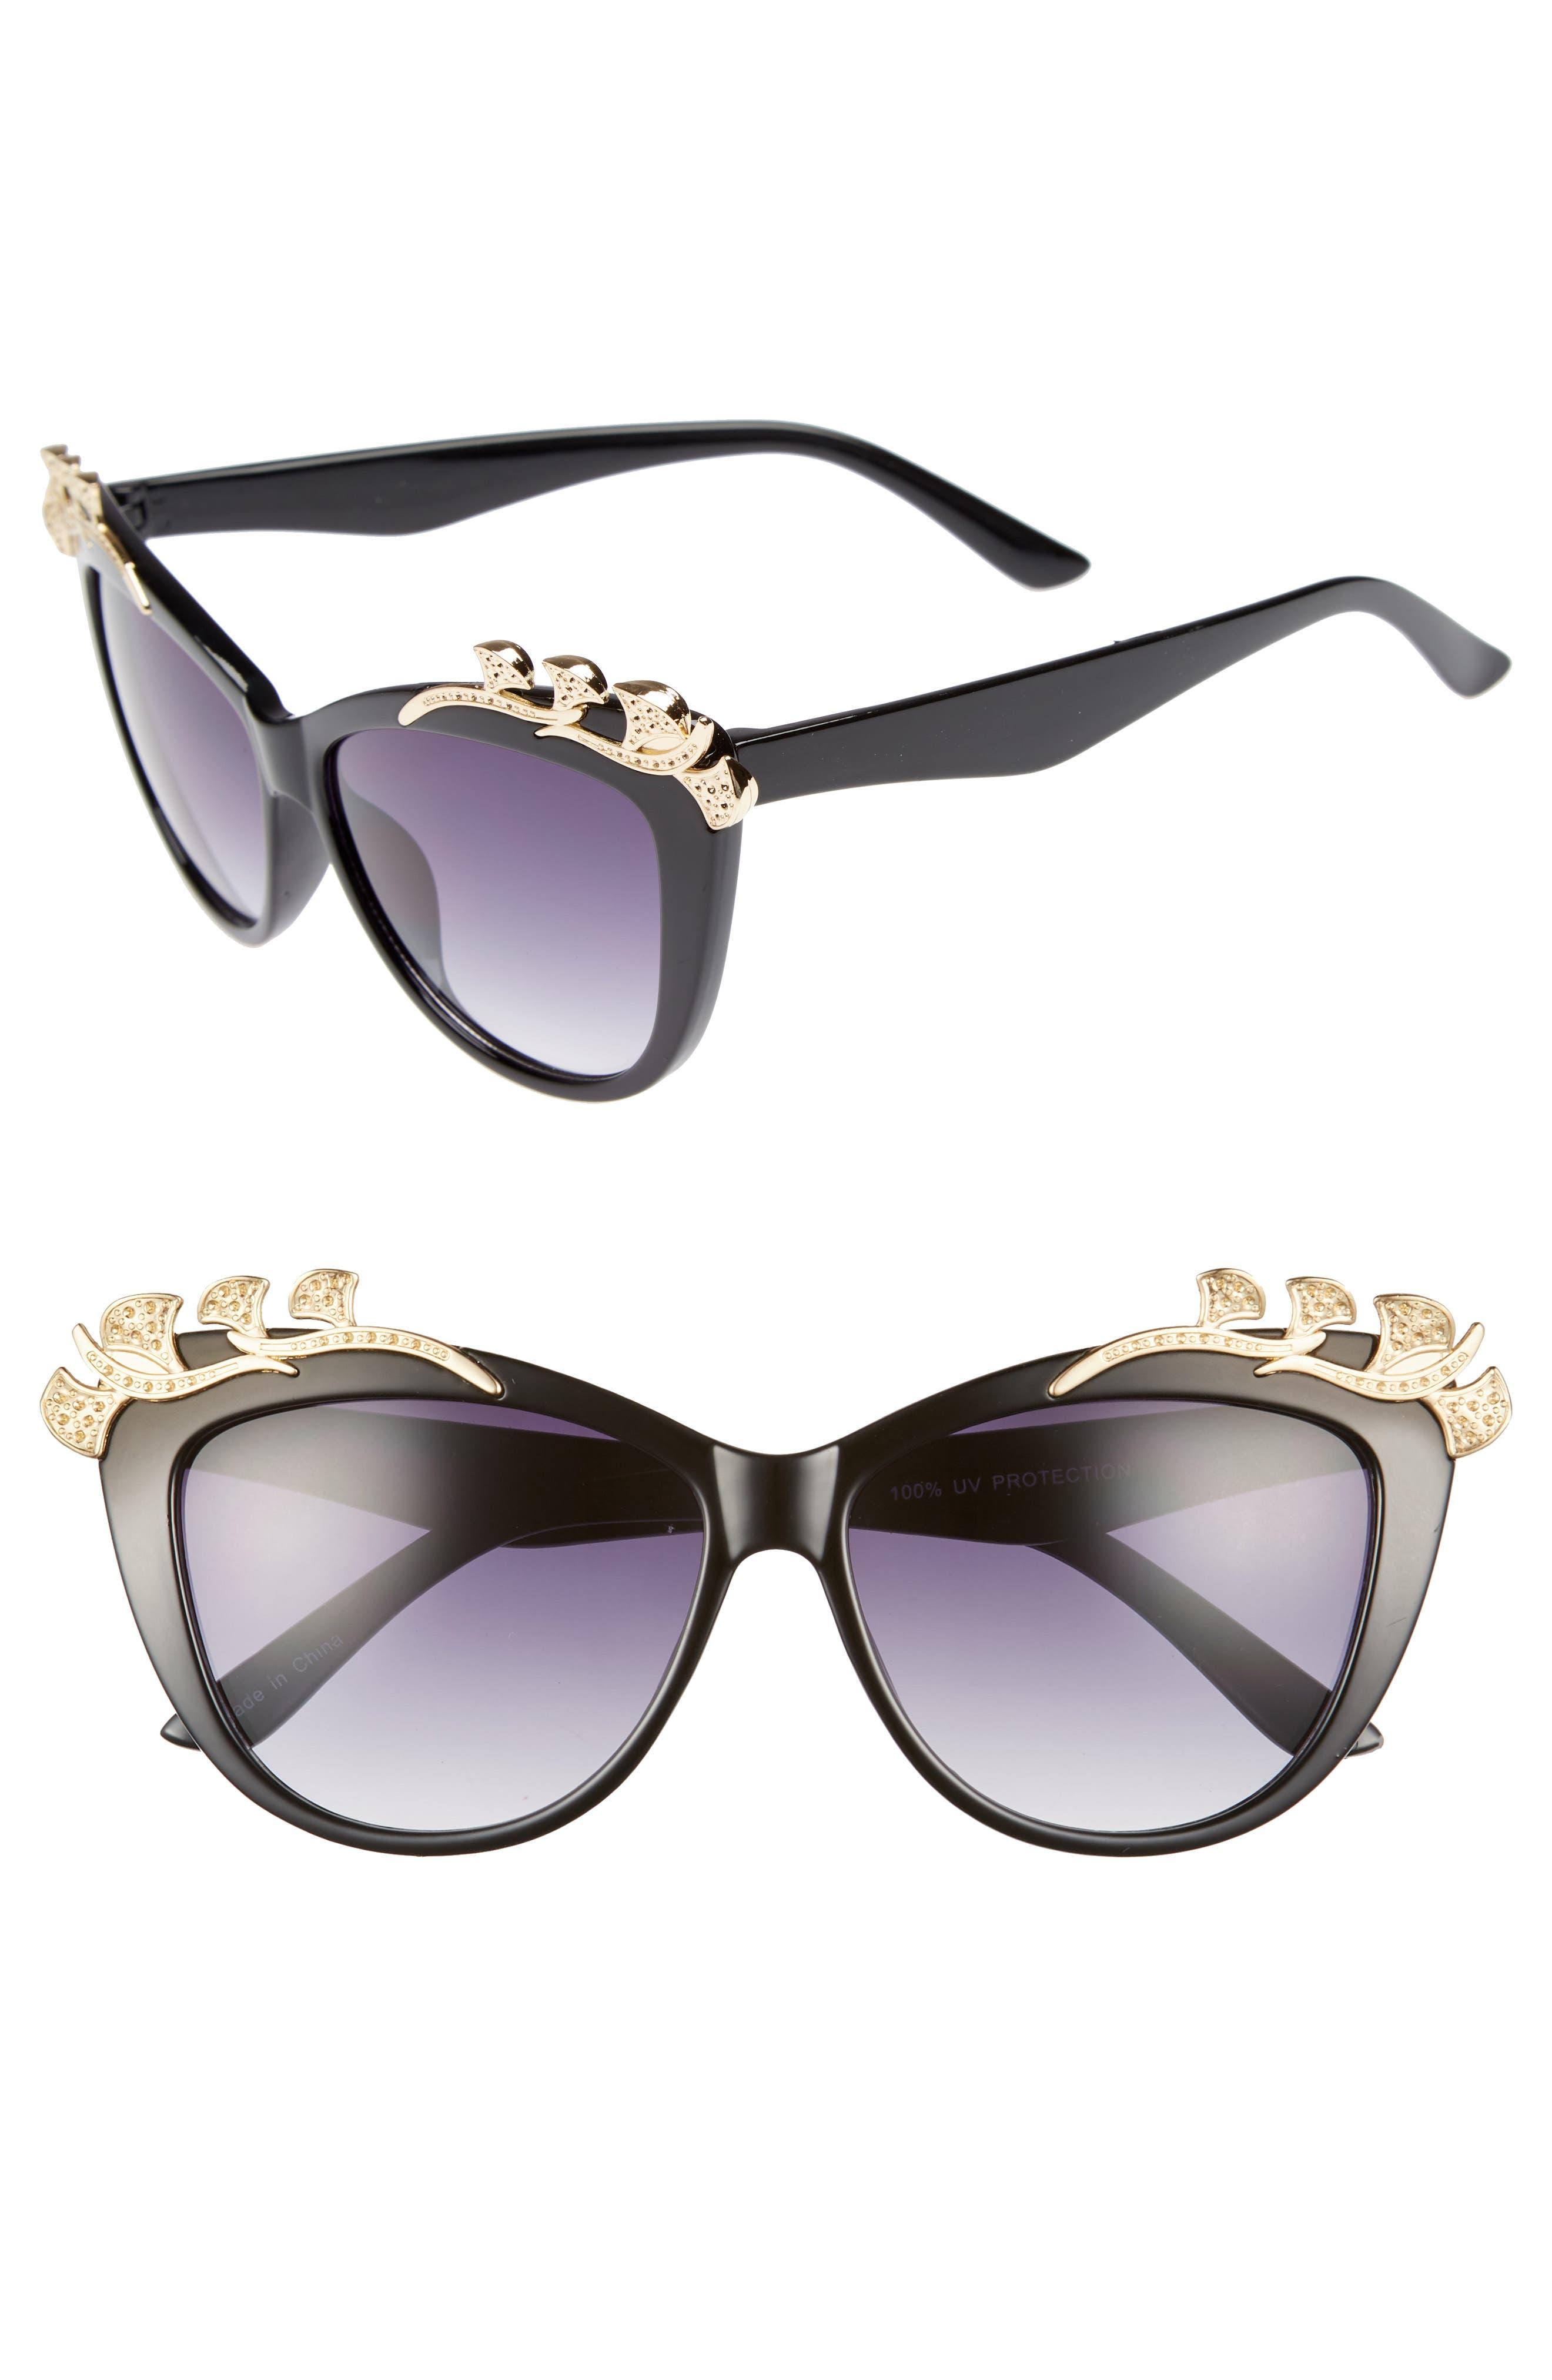 57mm Embellished Sunglasses,                             Main thumbnail 1, color,                             Black/ Gold